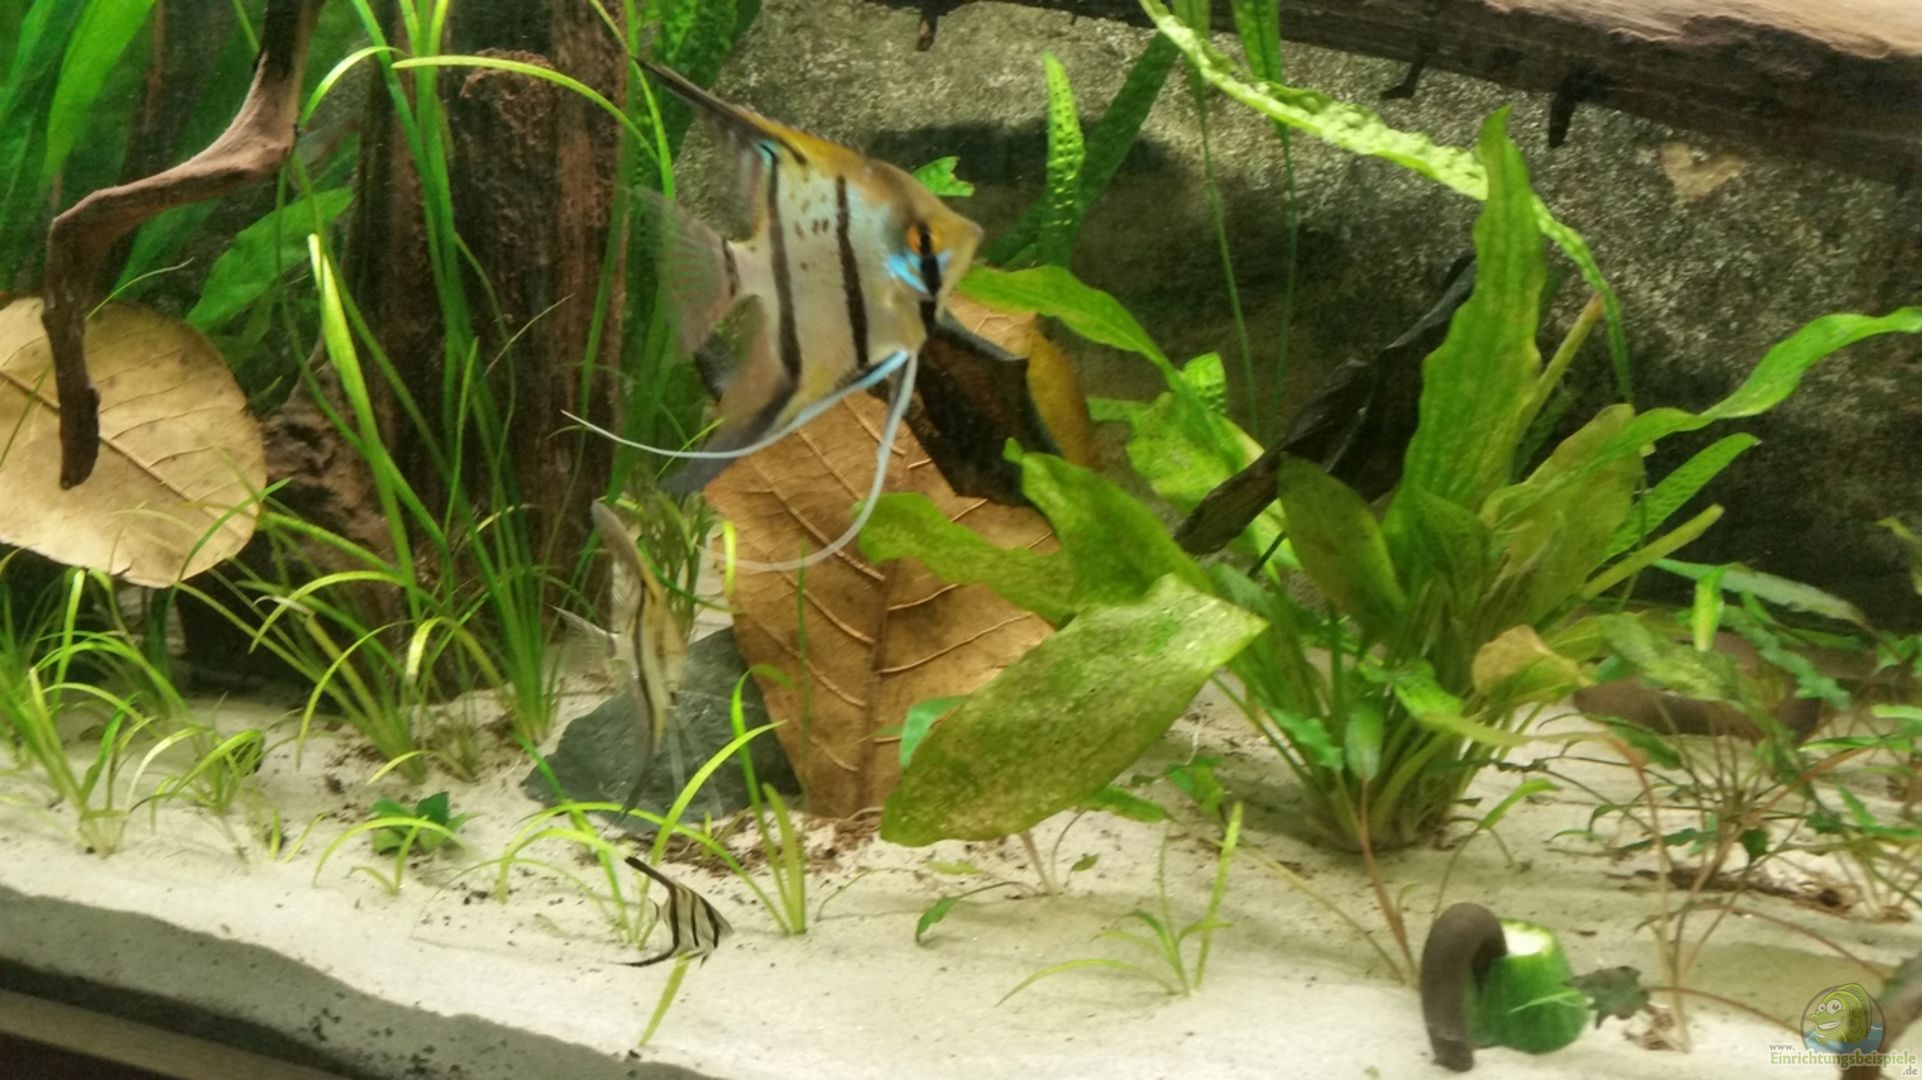 Aquarium von patrick s amazonas becken 32469 for Peru altum skalar